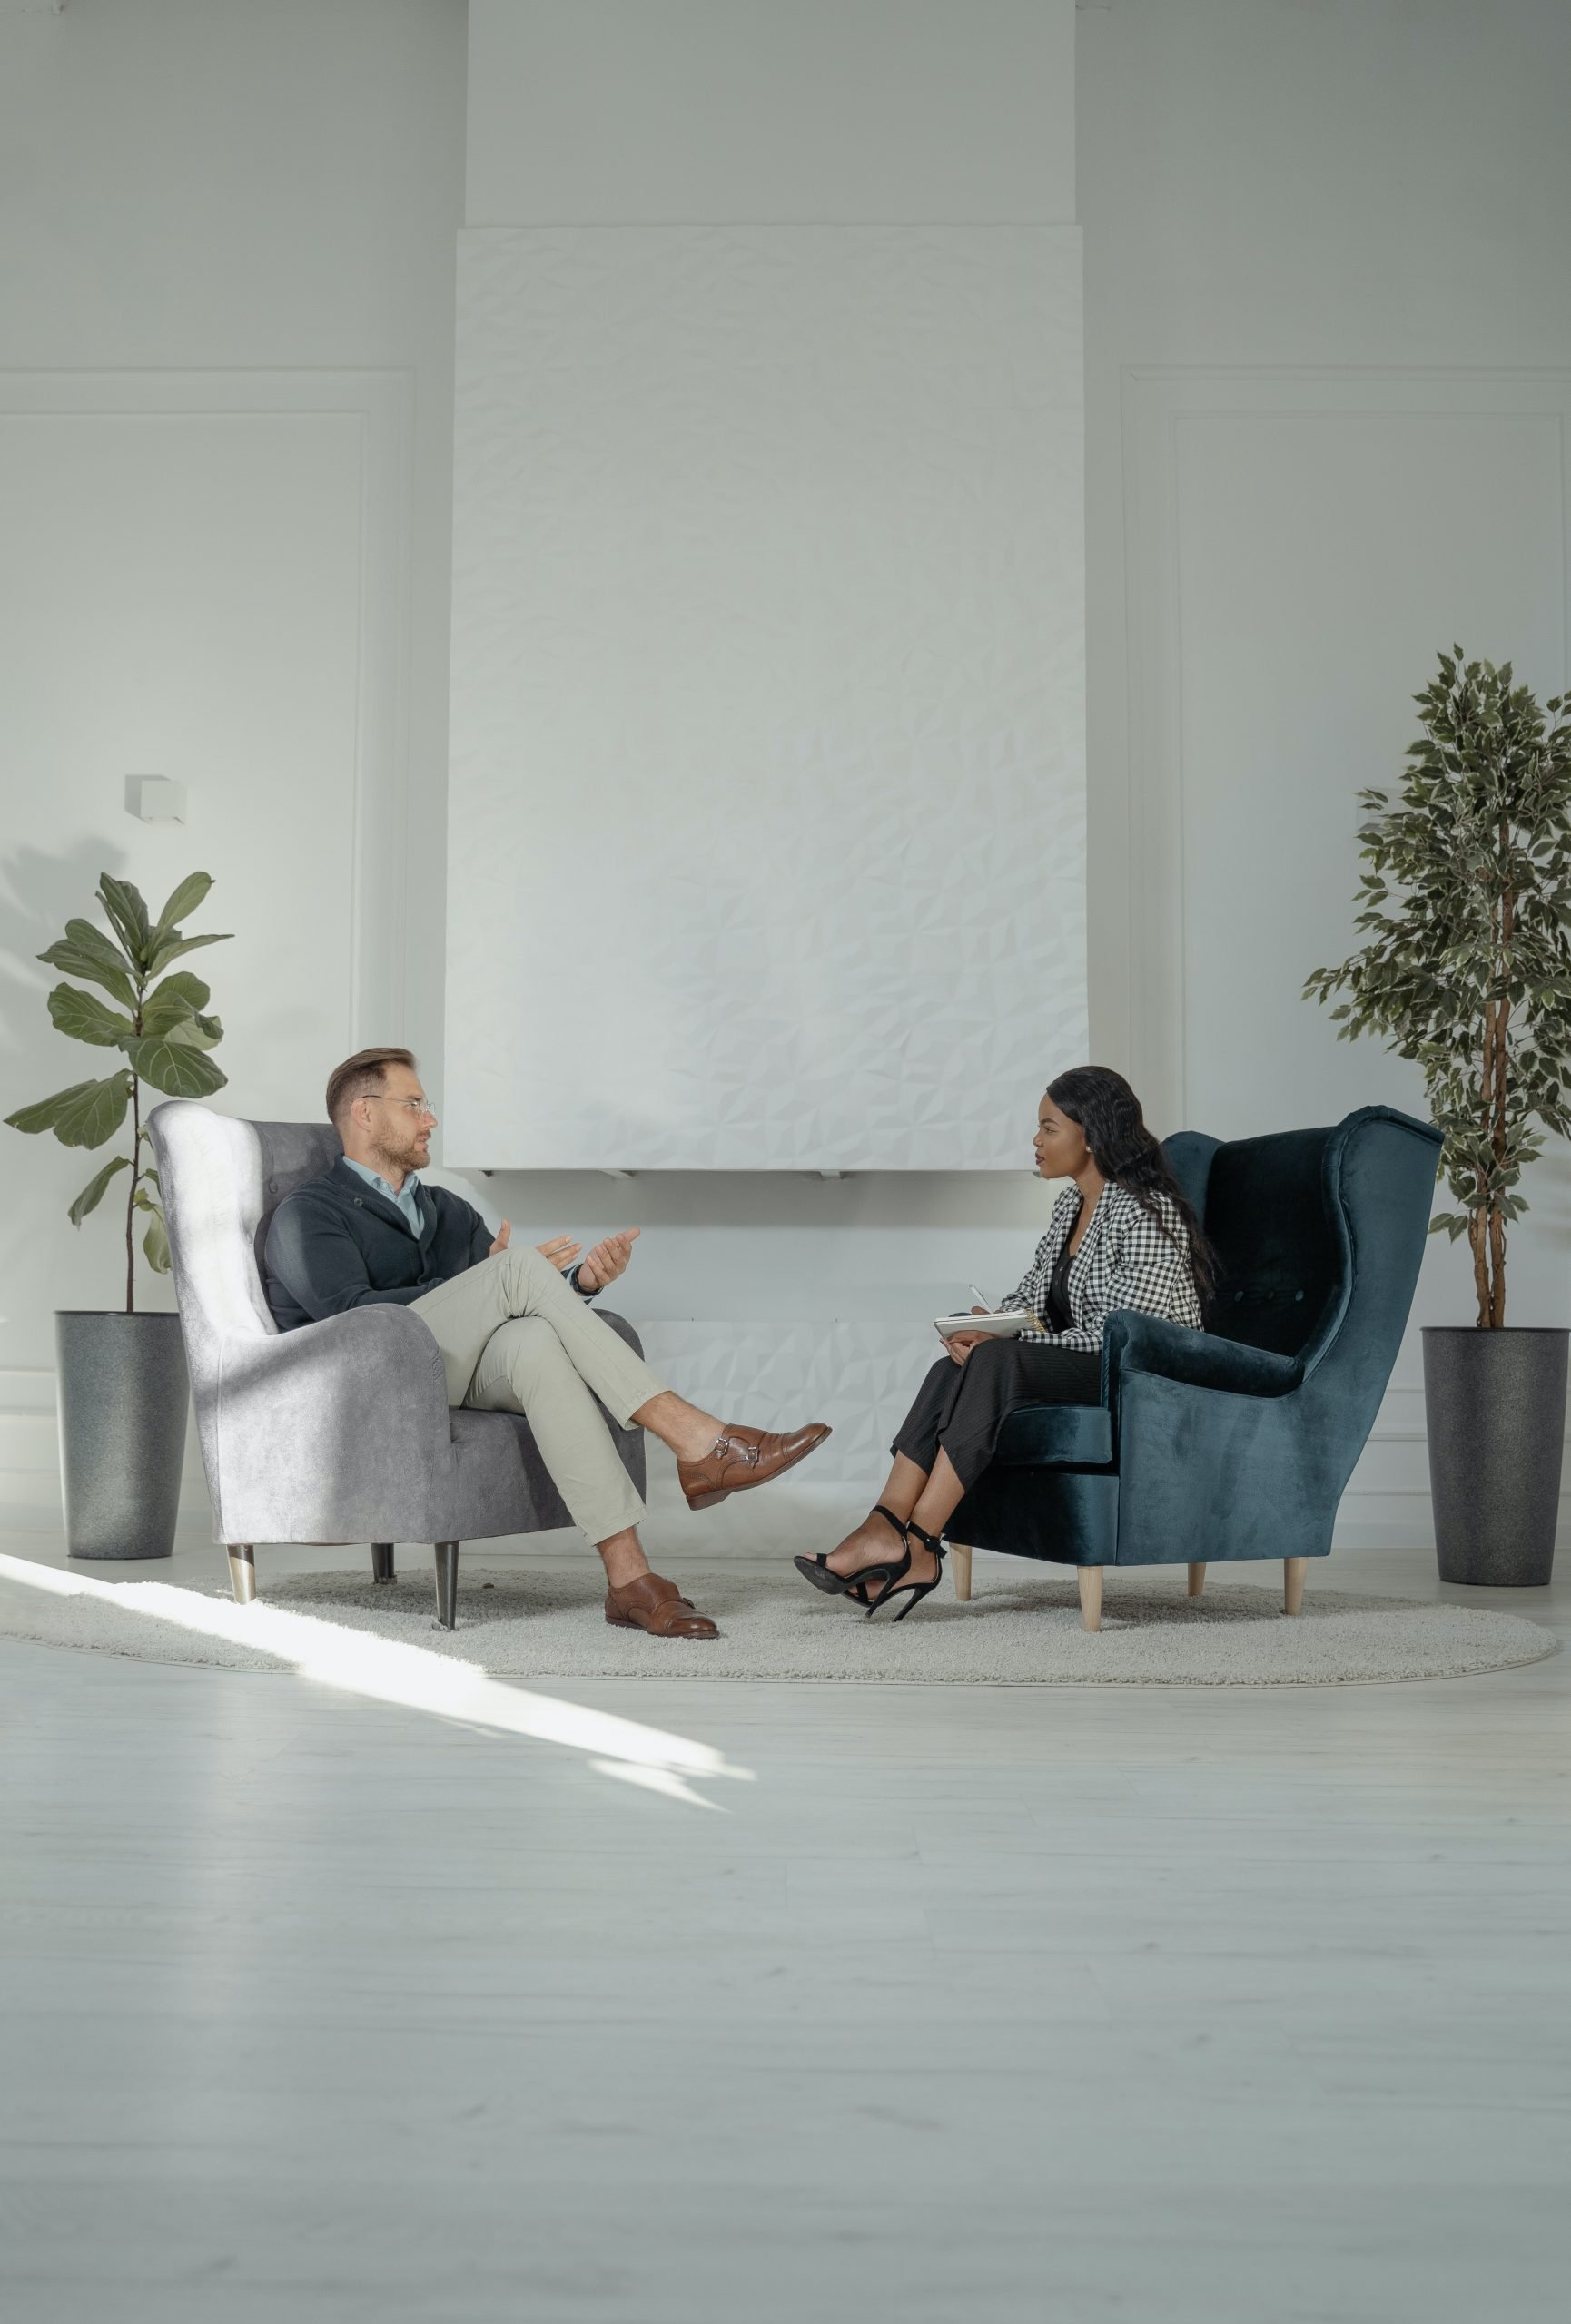 Interviews and Testimonials